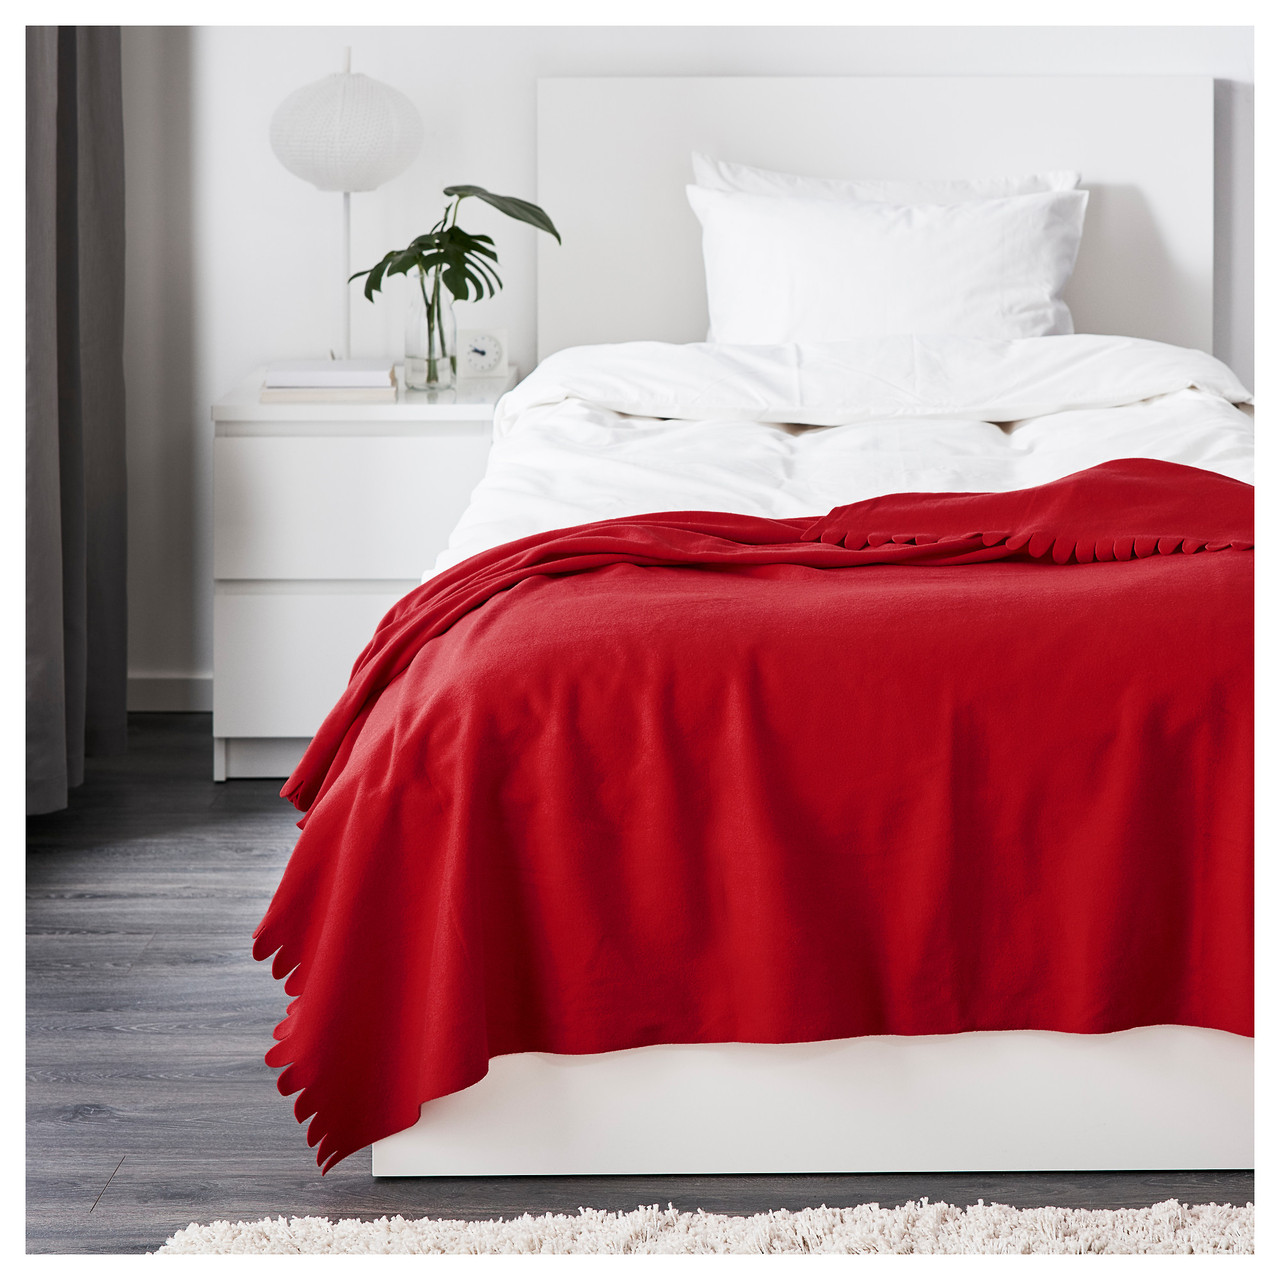 ПОЛАРВИДЕ Плед, красный, 130x170 см 80089927 IKEA, ИКЕА, POLARVIDE